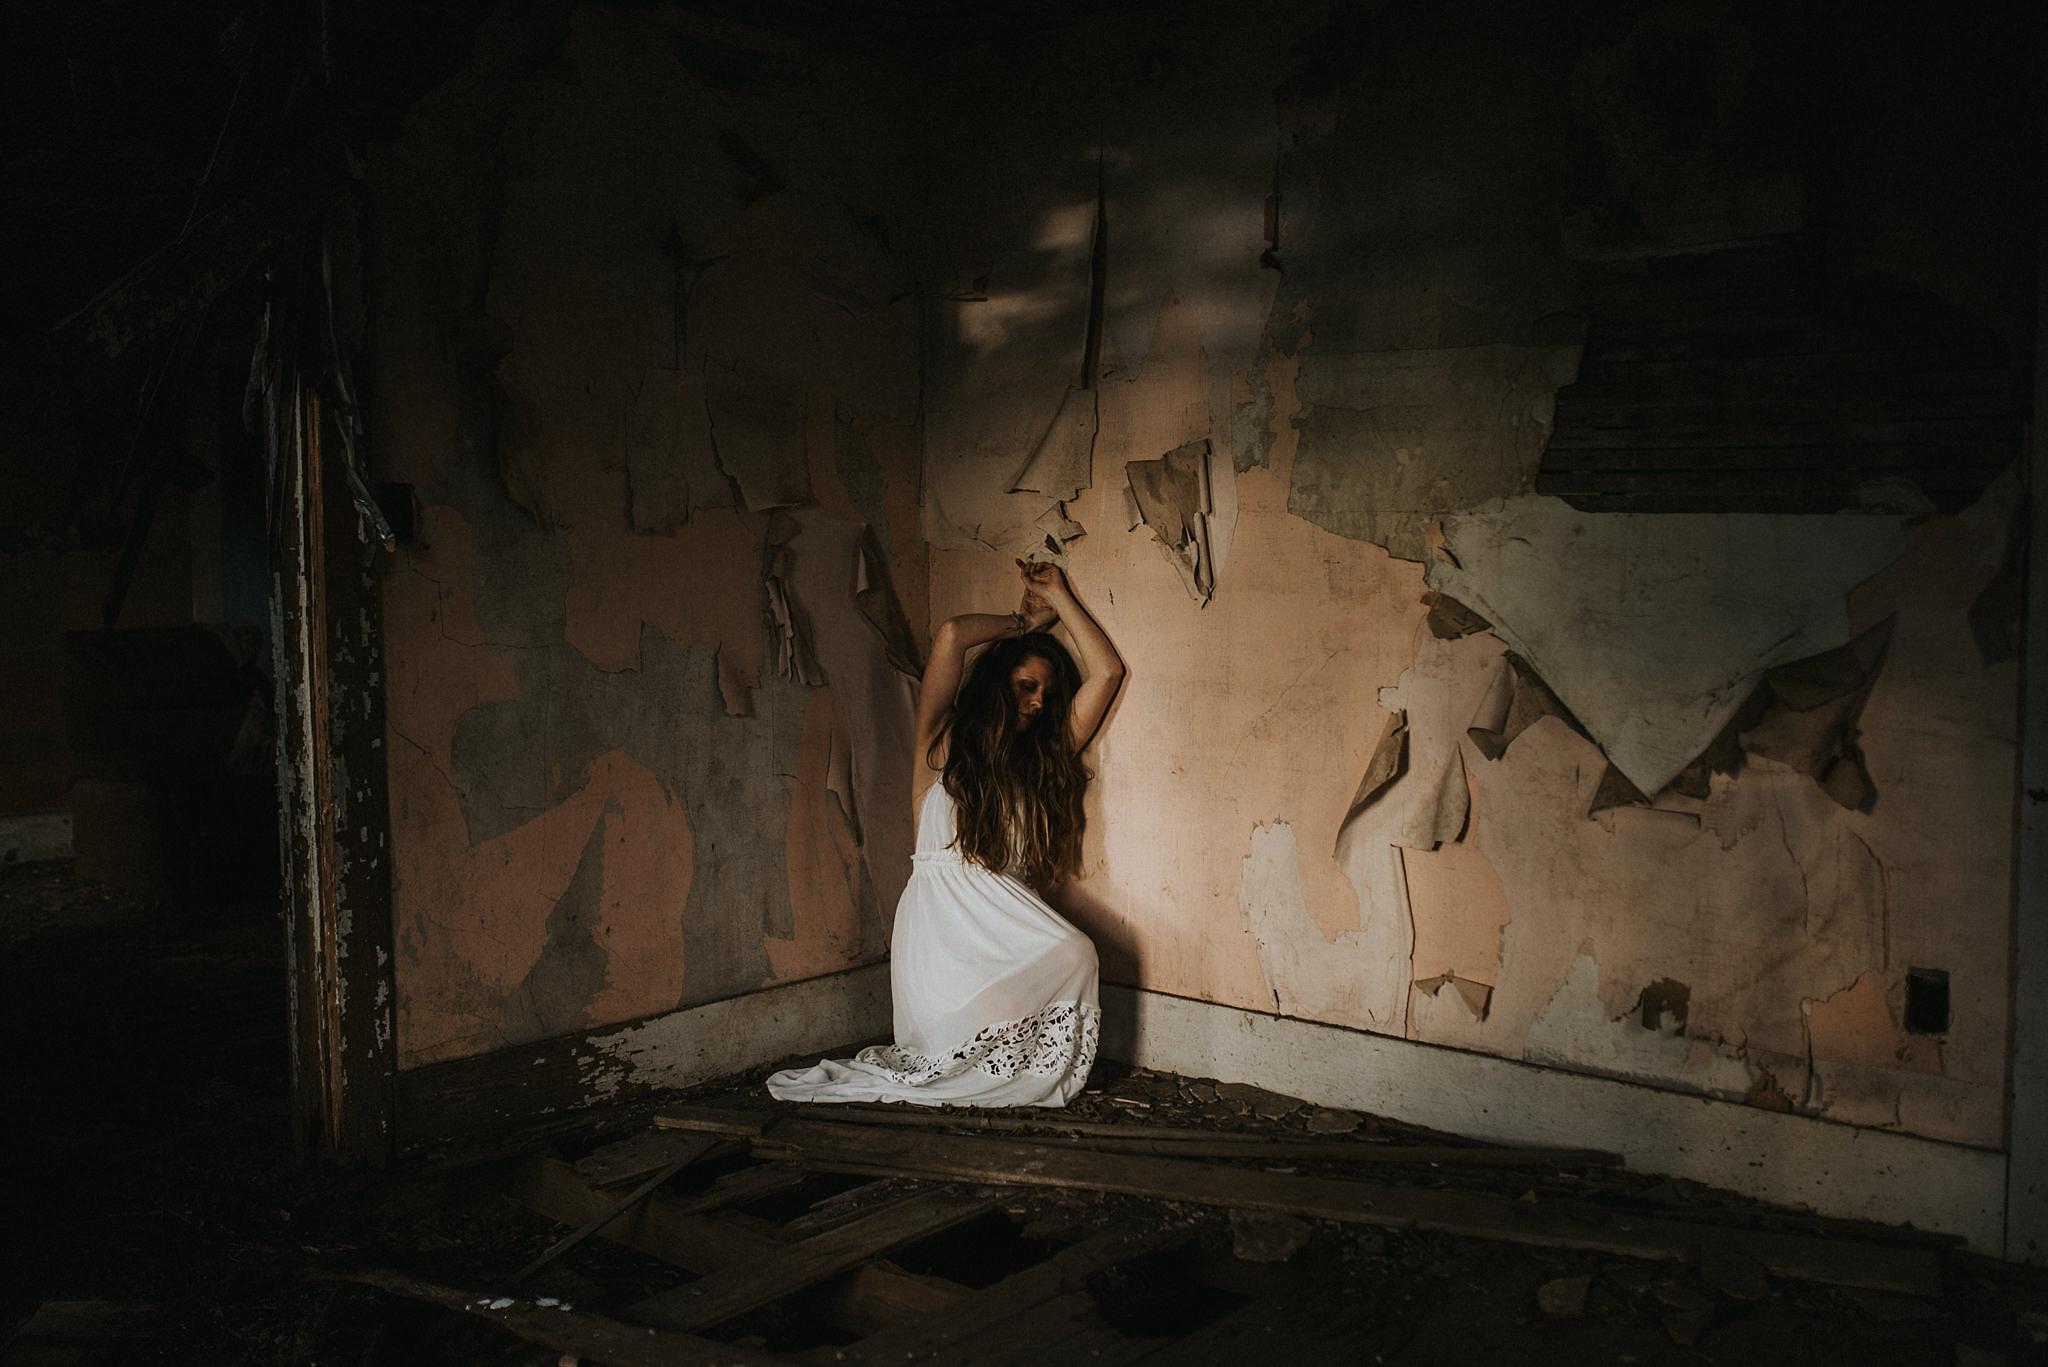 twyla jones photography - west palm beach florida photographer - boudoir in an old house-4999_treasure coast florida-1.jpg